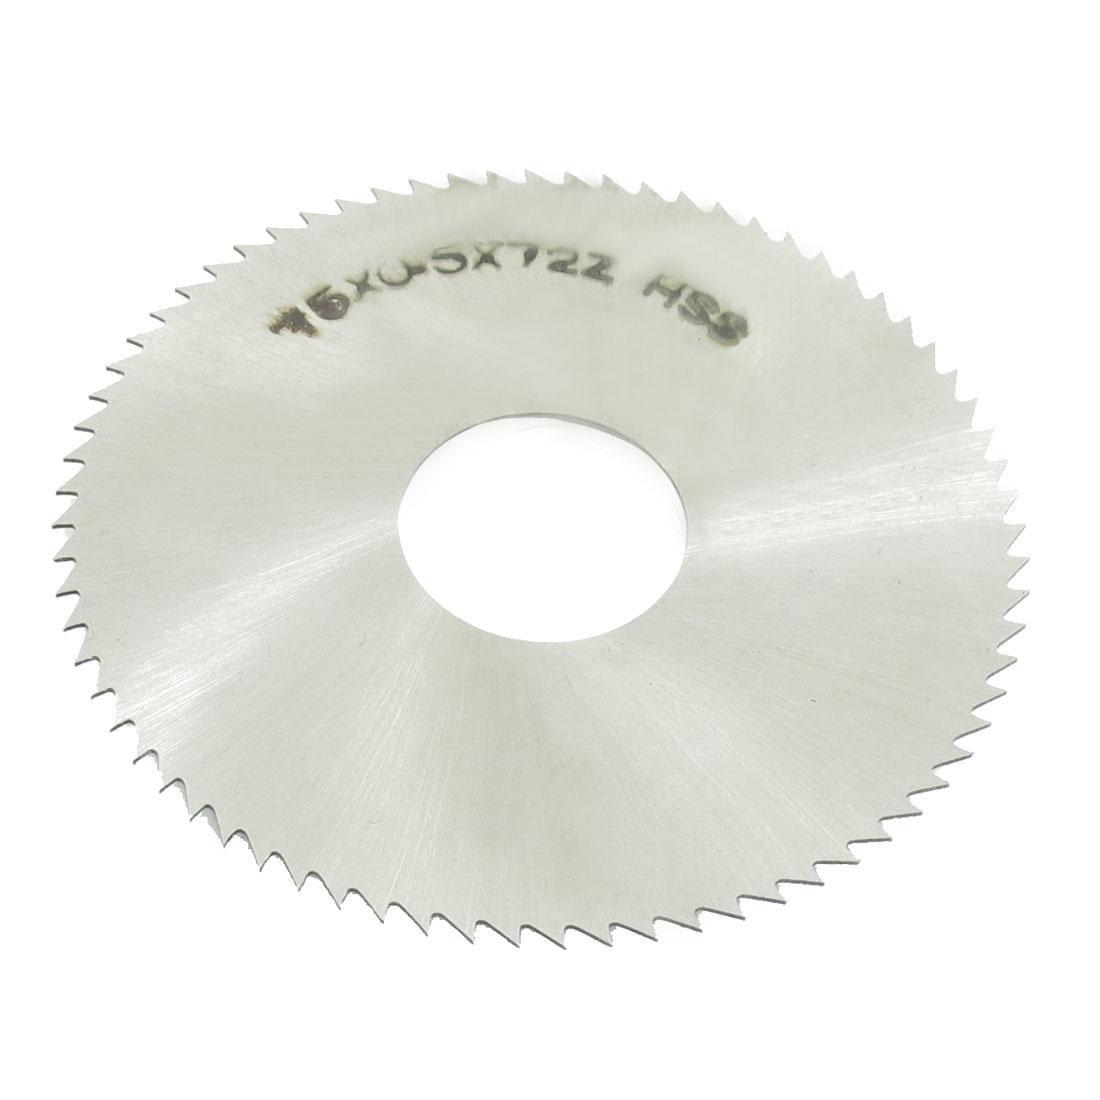 HSS 75mm Dia 0.5mm Thickness 72 Teeth Circular Milling Cutter Saw